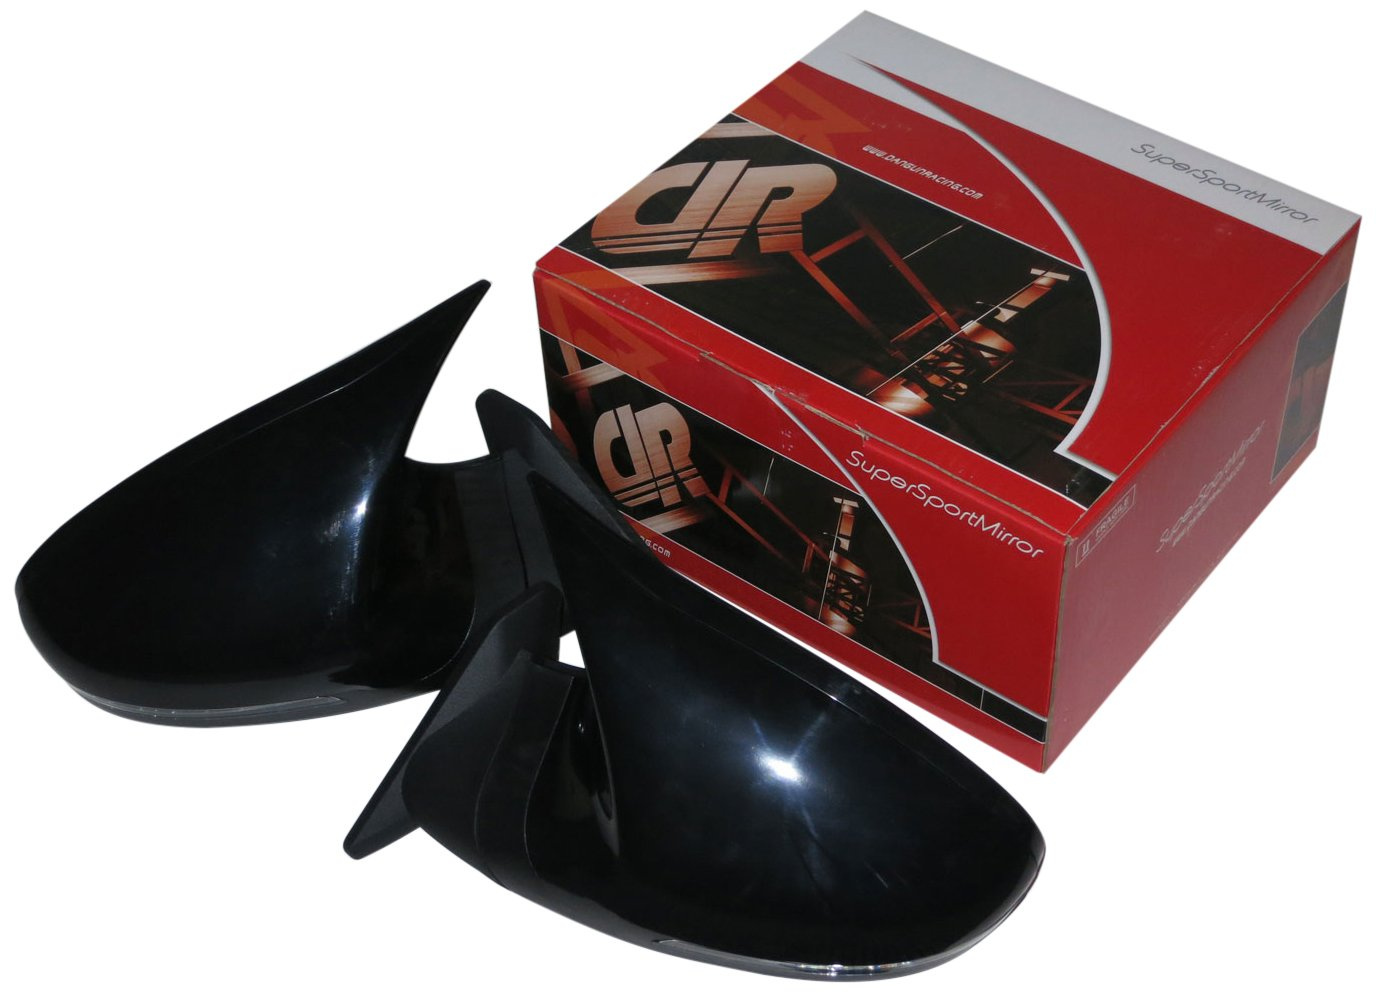 GTSミラー LED ブラック ミラー面電動調整 右ハンドル ホンダ シビック EG系/EJ1 4ドア [1991~1995] SBMGTSBKALHR-1102 B072R668BW ホンダ シビック EG系/EJ1 4ドア [1991~1995]|ブラック ブラック ホンダ シビック EG系/EJ1 4ドア [1991~1995]